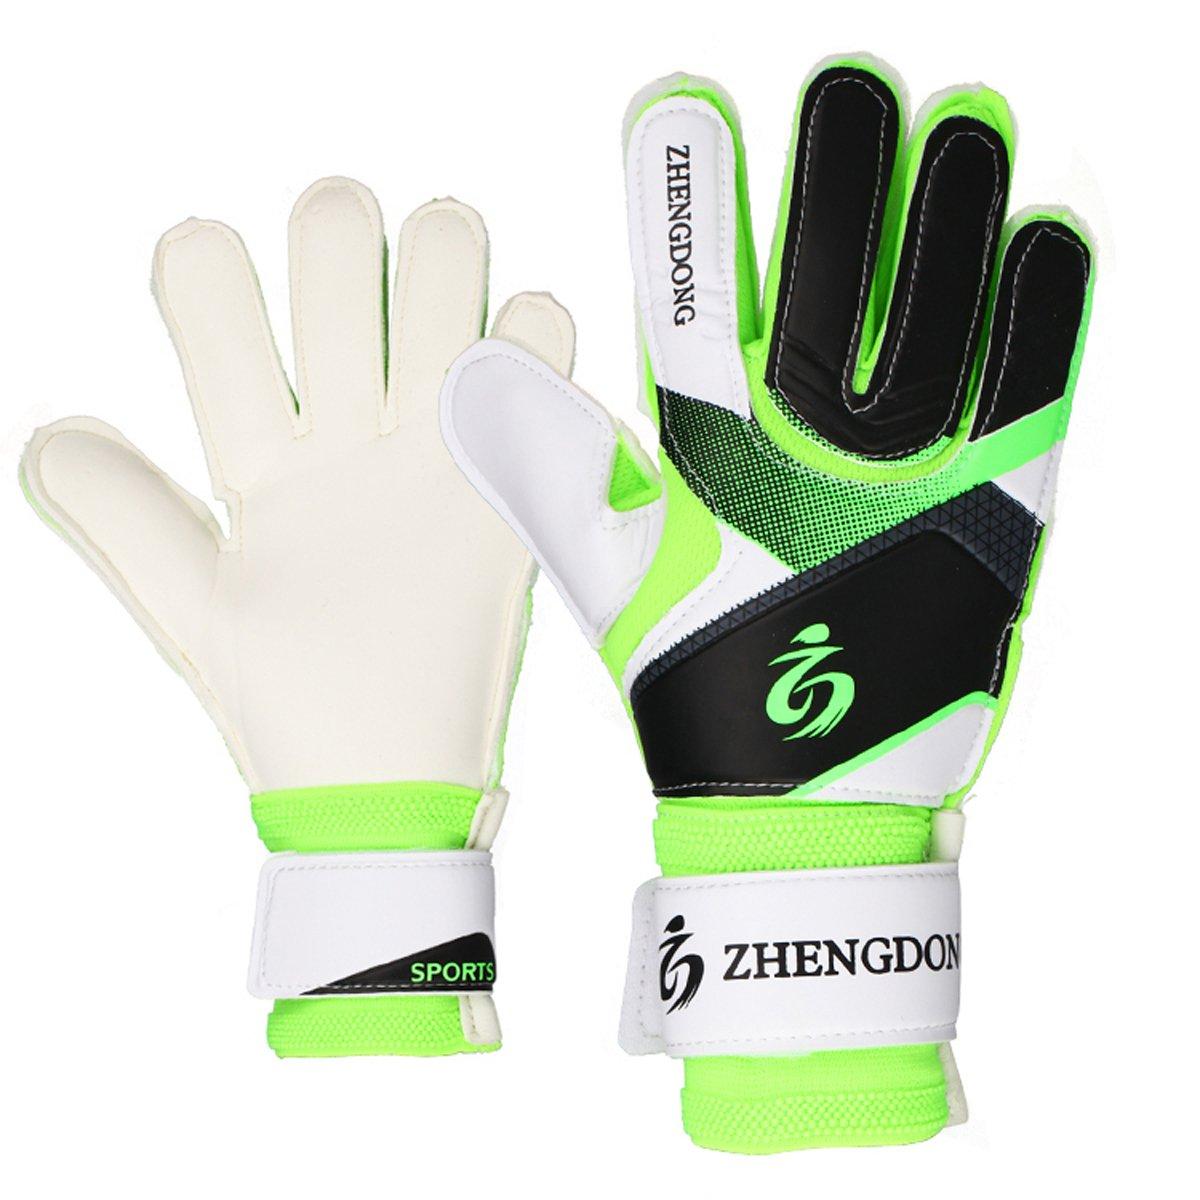 Youth Goalie Gloves ( # 8 # 9 )初心者用Goalies、指を保護、安全、快適、柔らかさと耐久性のすべての種類の天気 B07BGCMHLYグリーン 8